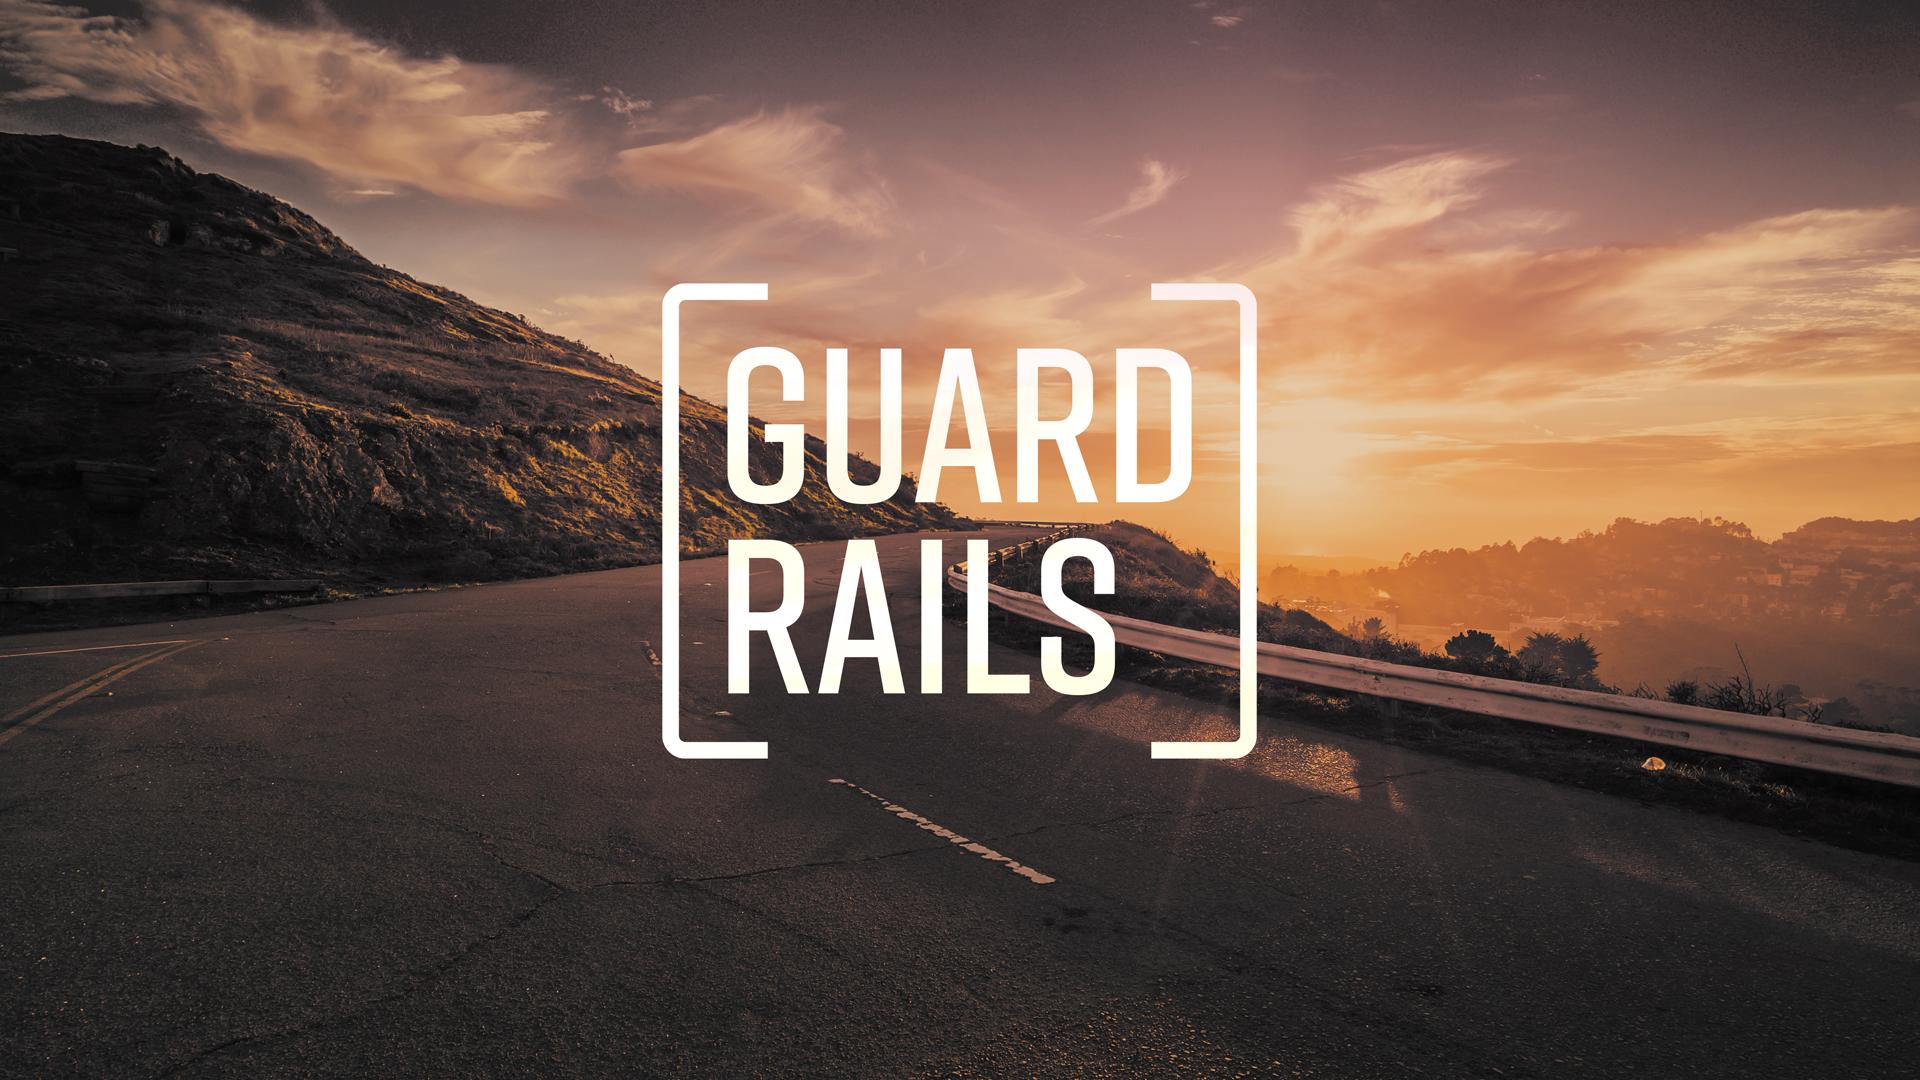 - Guardrails 1: Direct & ProtectMay 19, 2019Speaker: Aaron Laramore